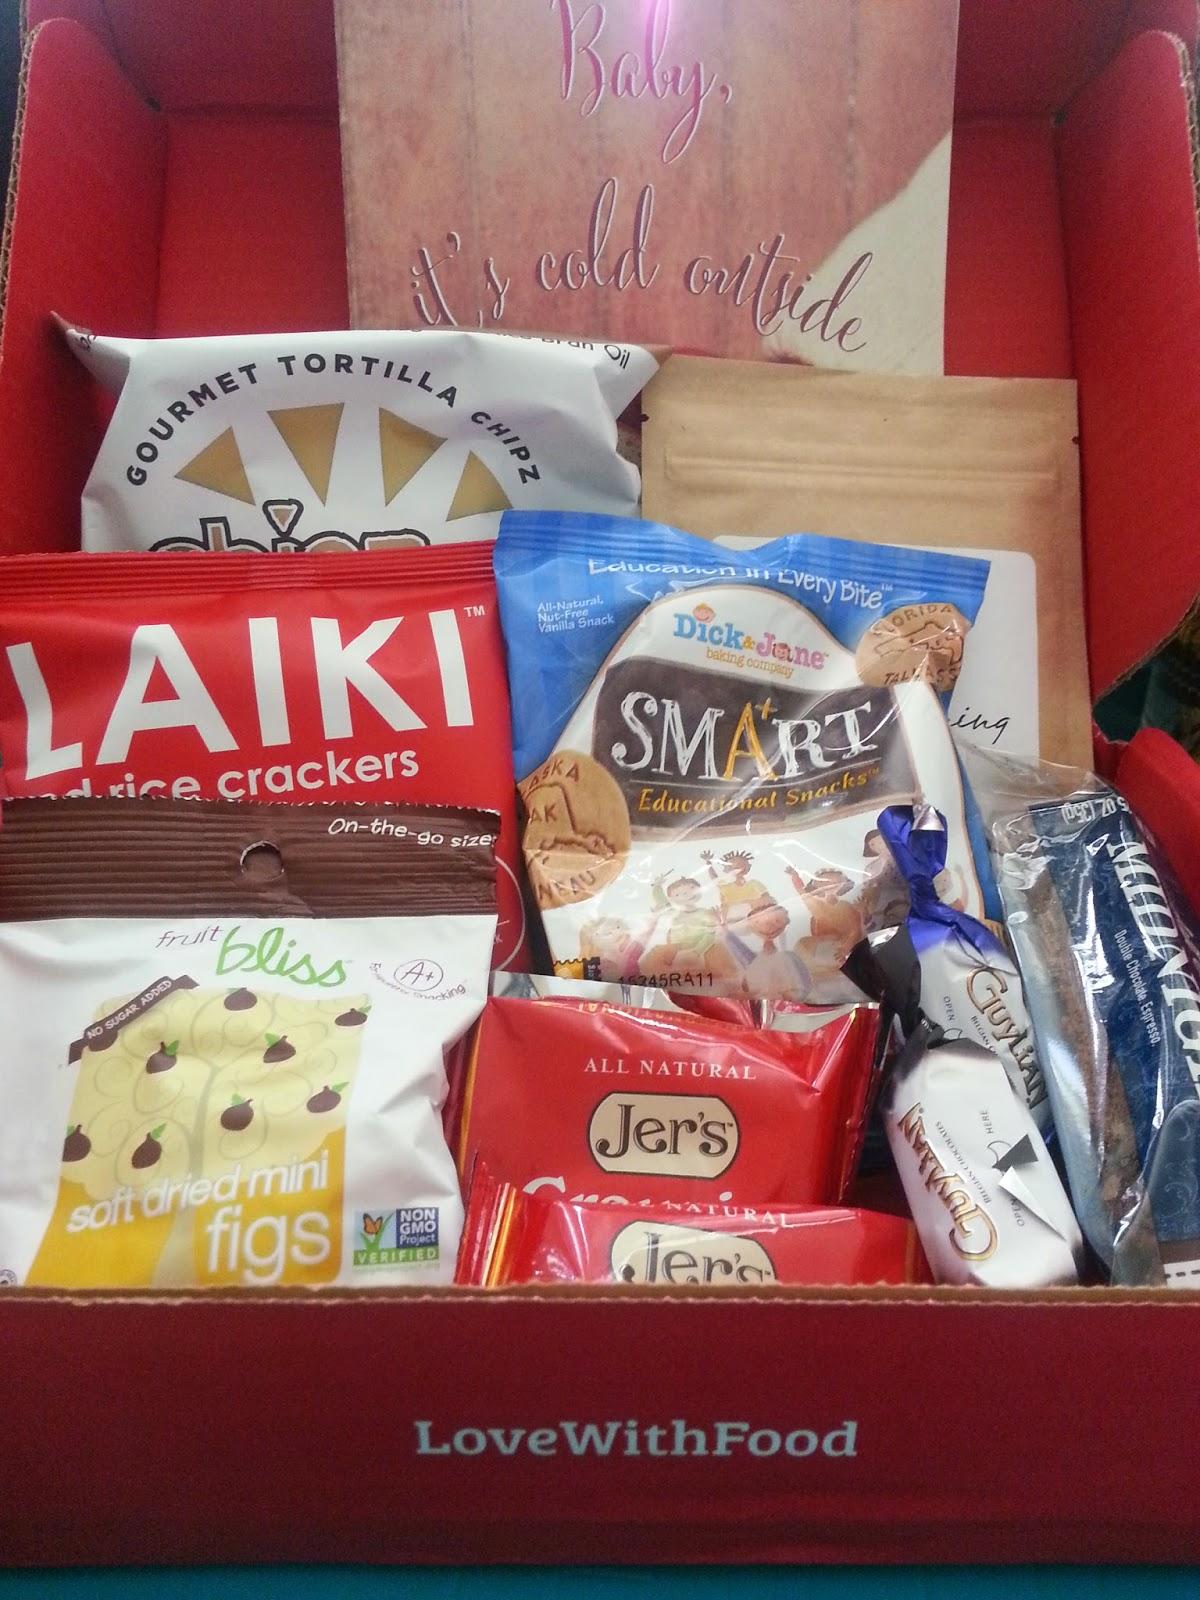 Love with Food box November